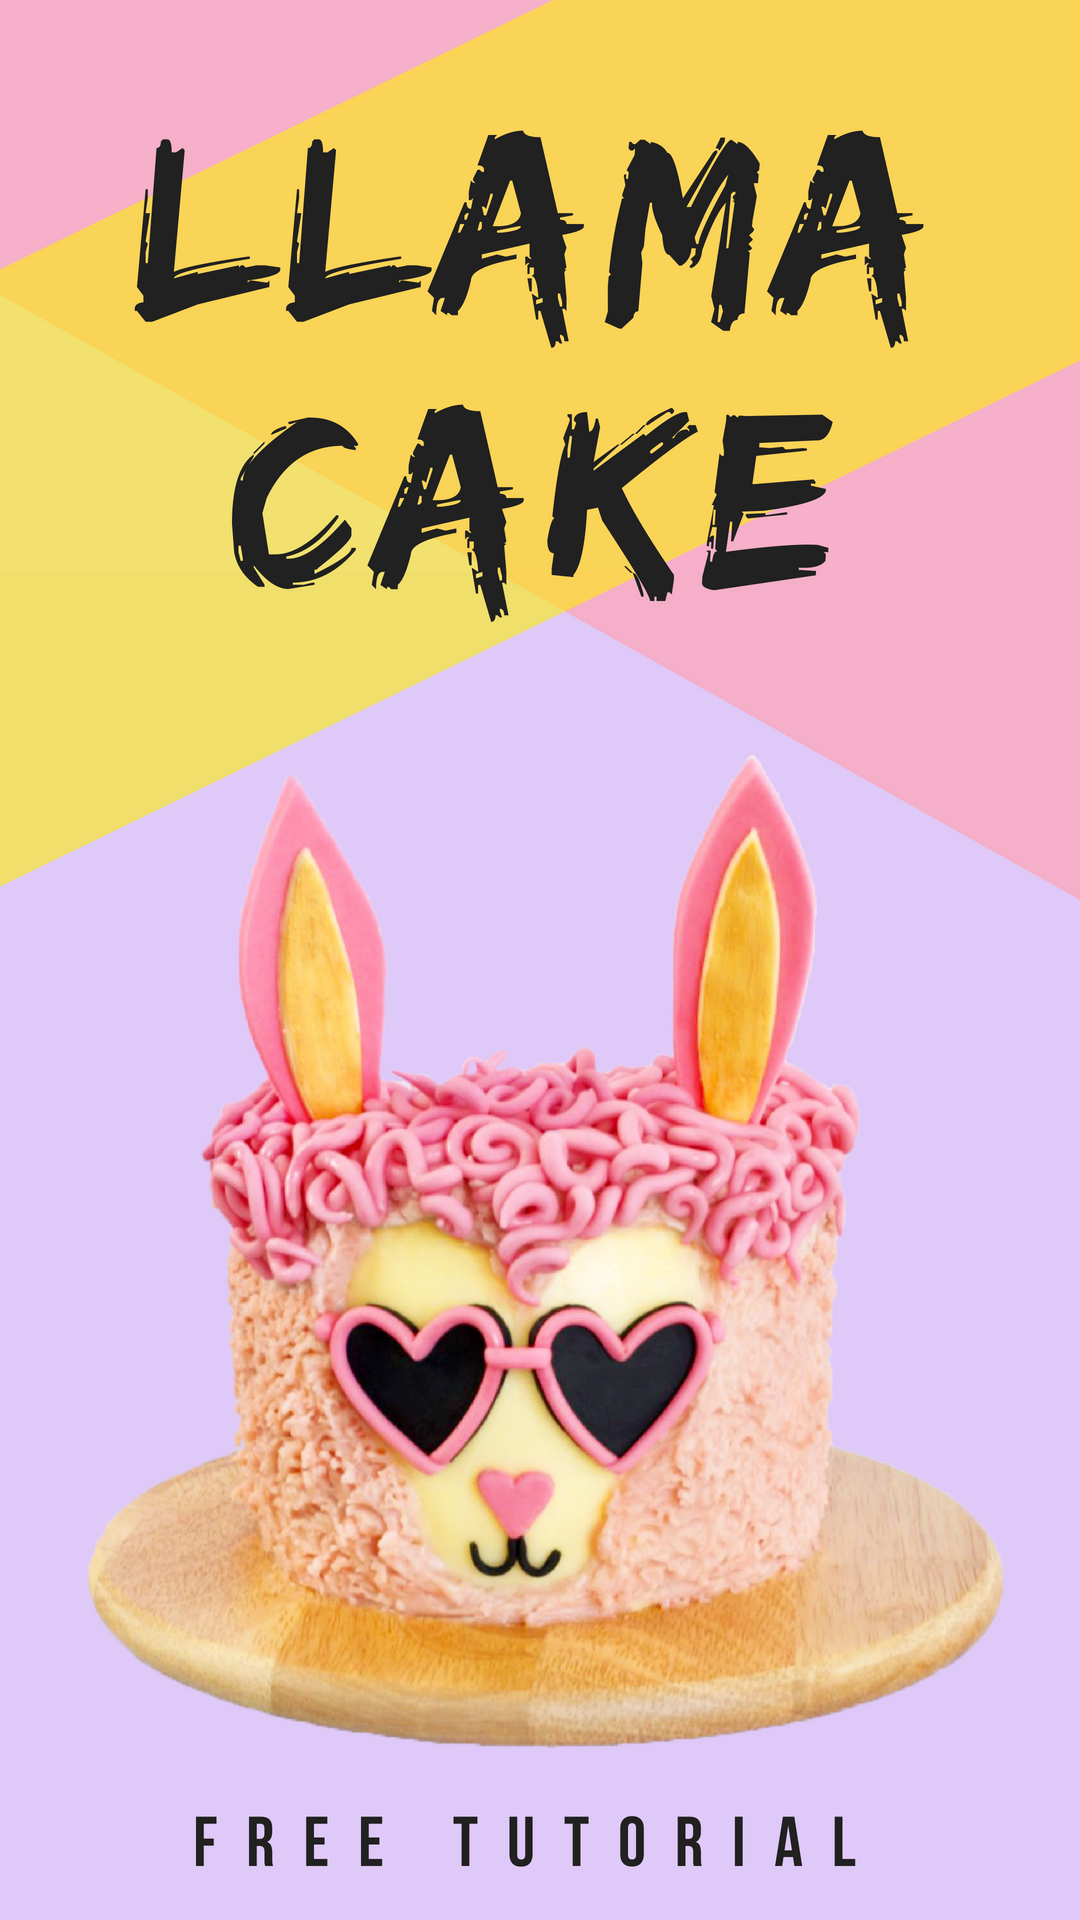 Cool AF Pink Llama Cake Tutorial